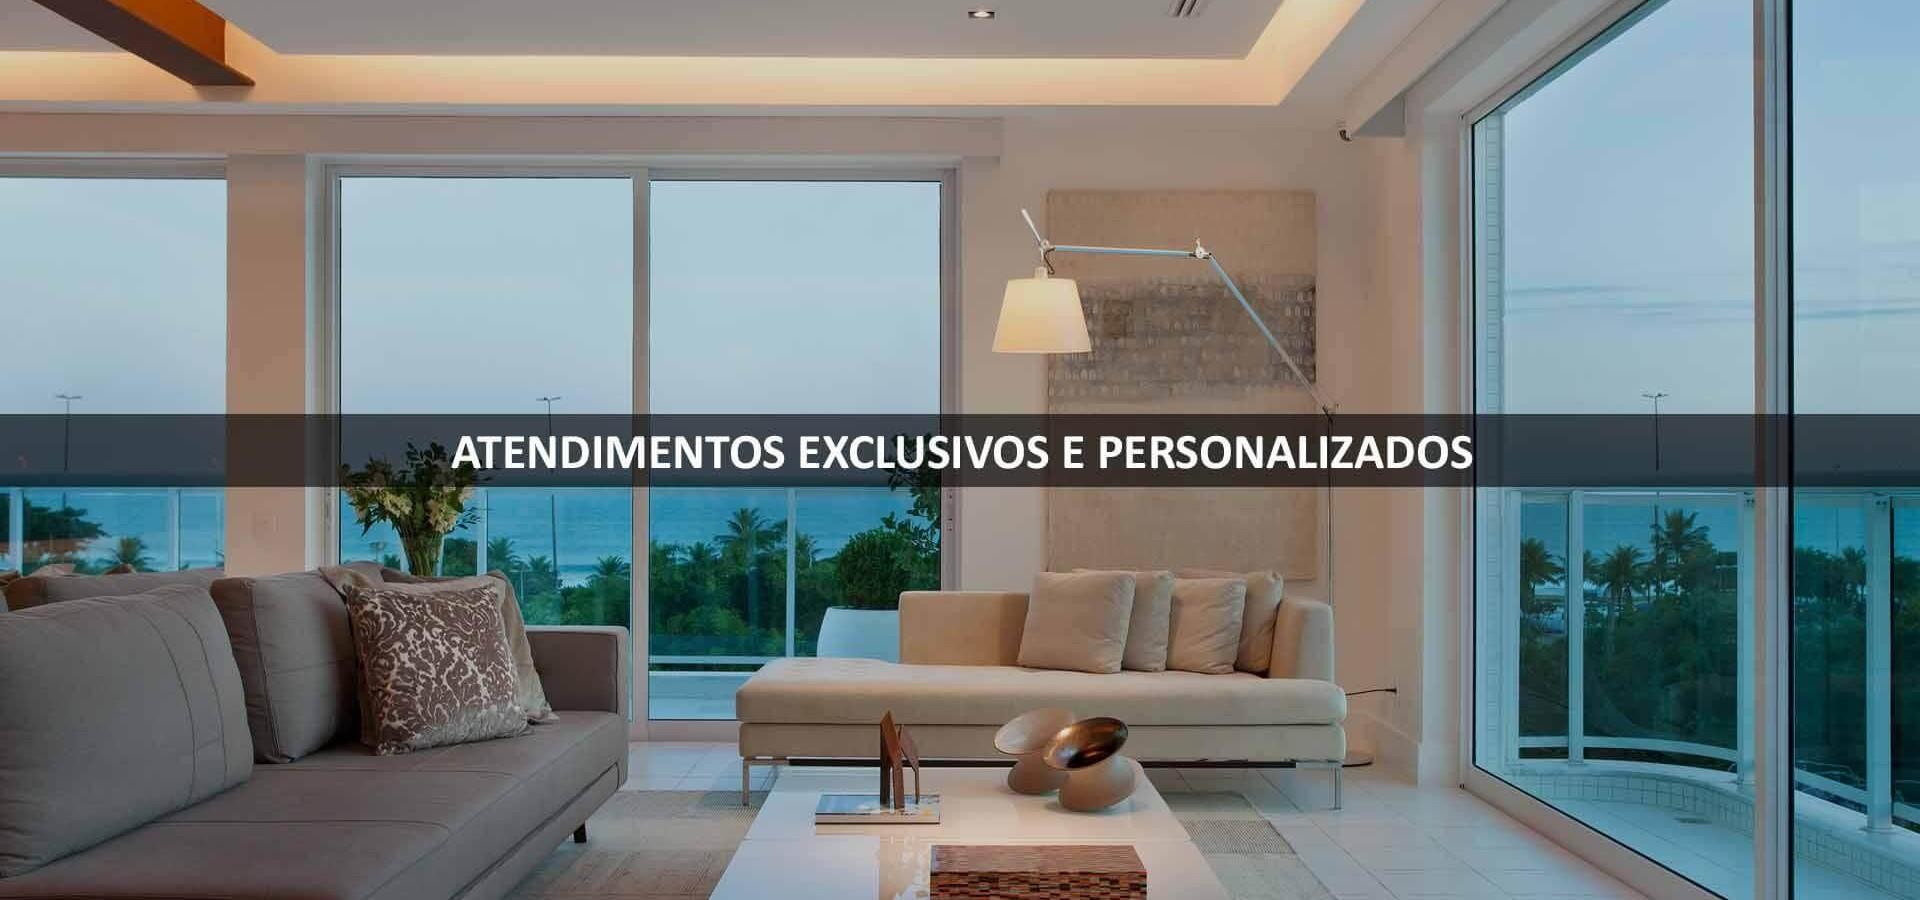 ATENDIMENTOS EXCLUSIVOS E PERSONALIZADOS_